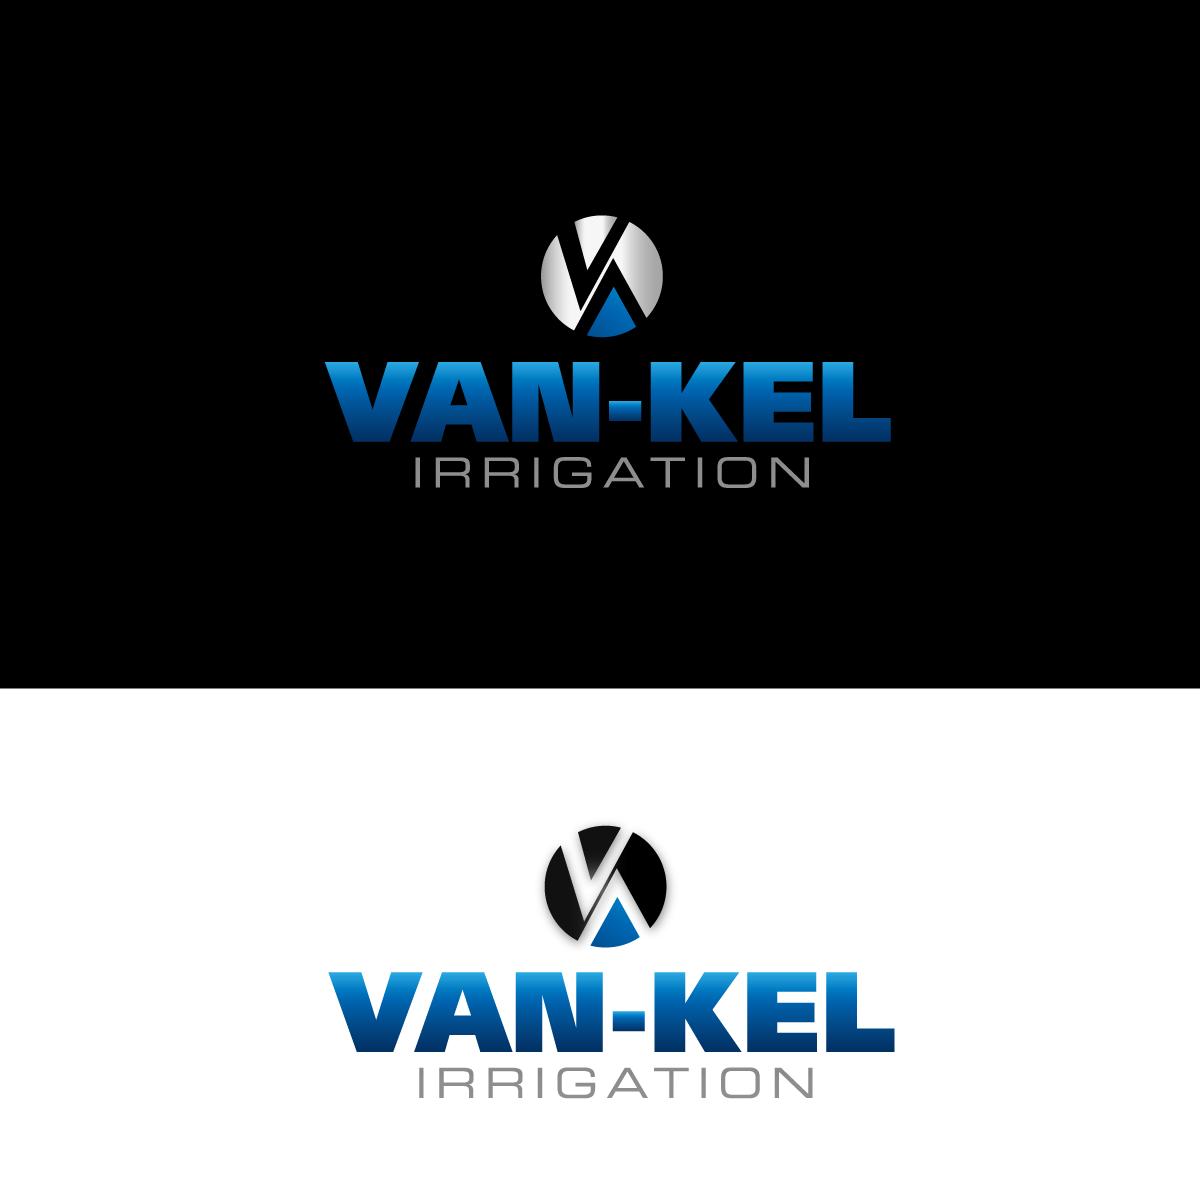 Logo Design by rockin - Entry No. 183 in the Logo Design Contest Van-Kel Irrigation Logo Design.